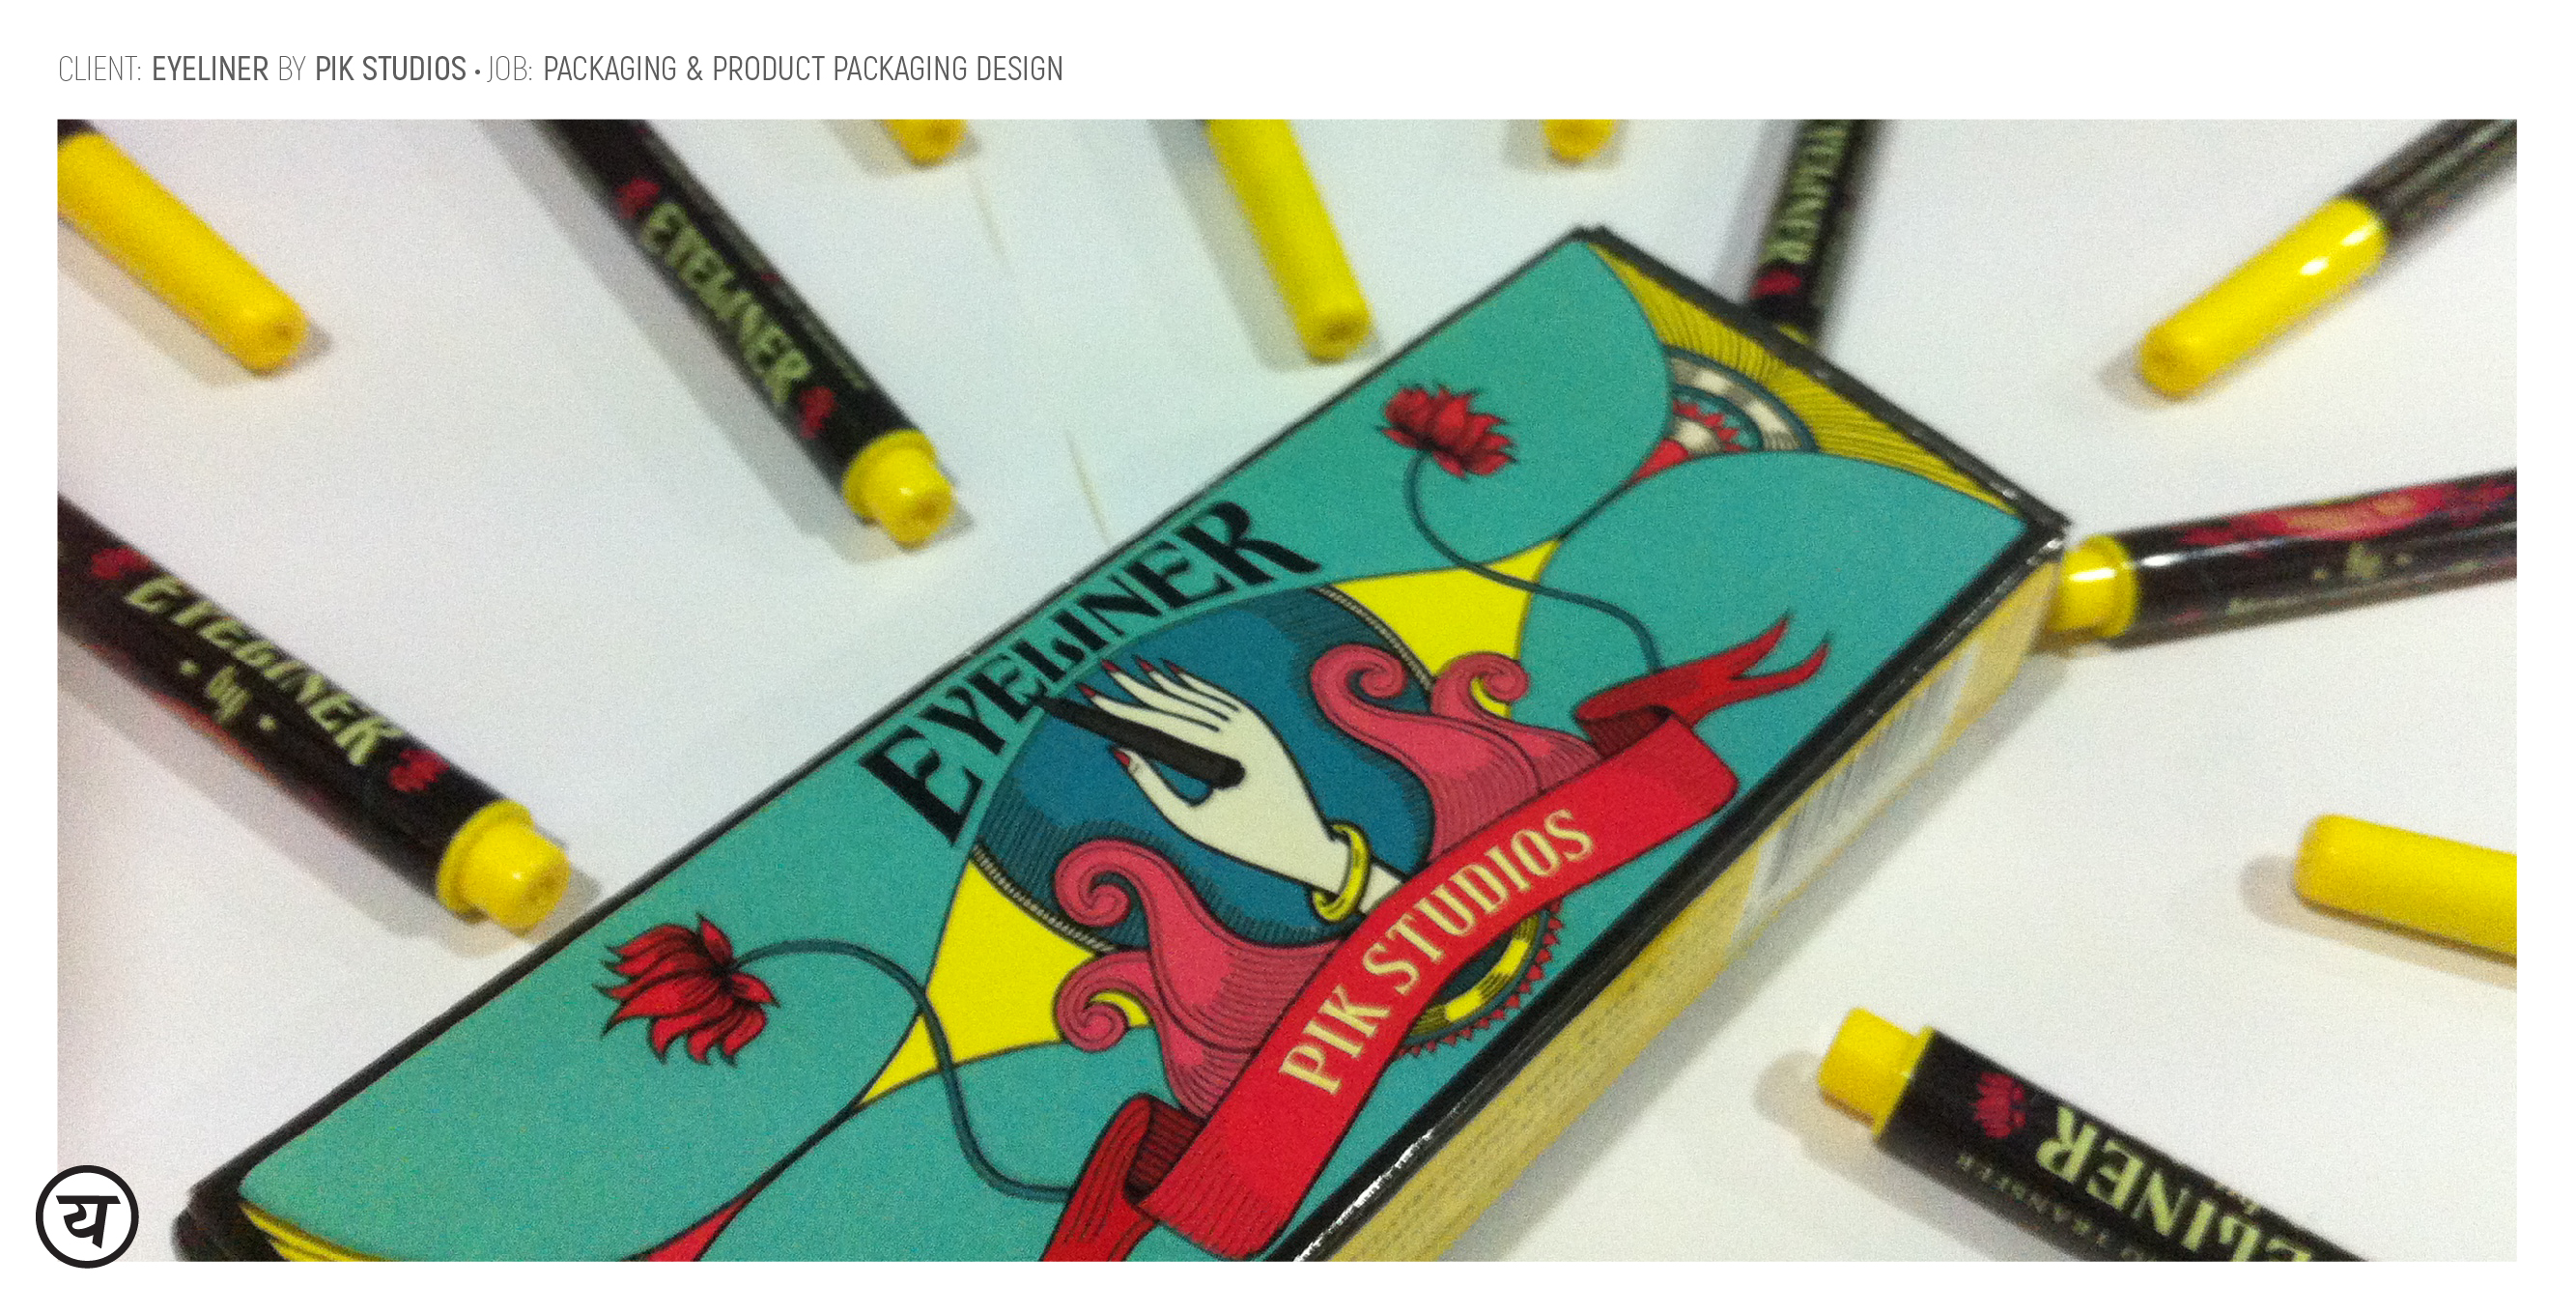 YesYesWhyNot_Communication Design_Pik Studios #2